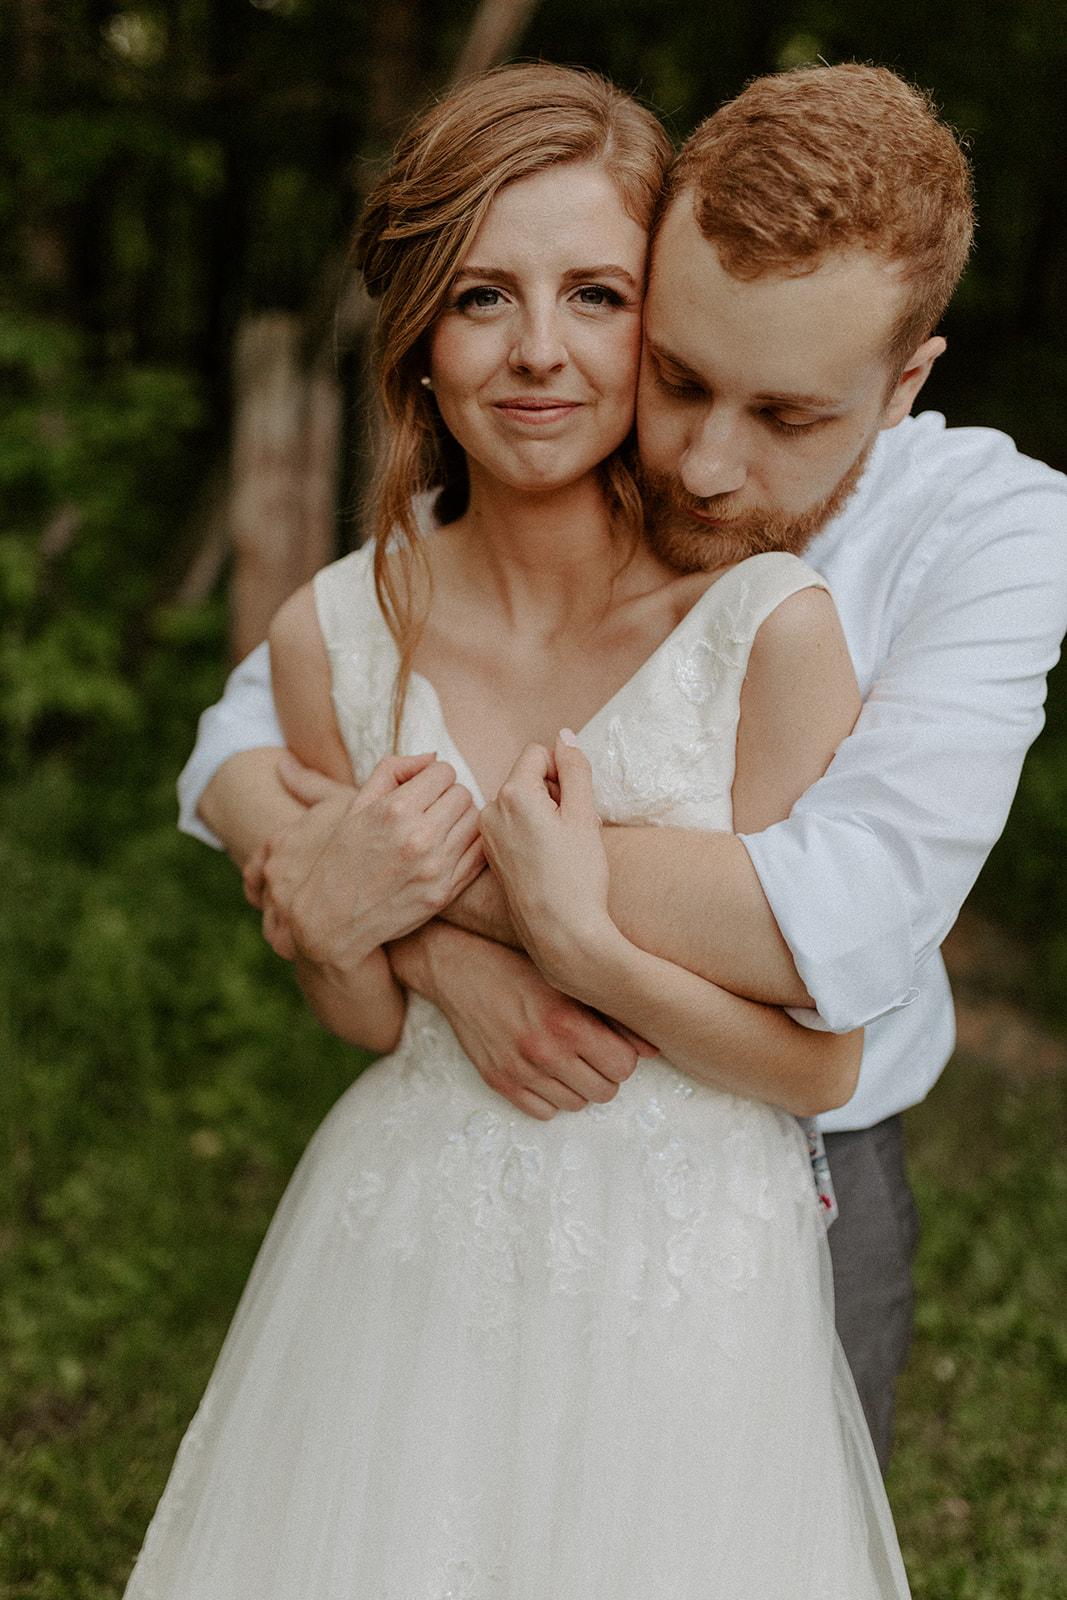 camp_wokanda_peoria_illinois_wedding_photographer_wright_photographs_bliese_0741.jpg